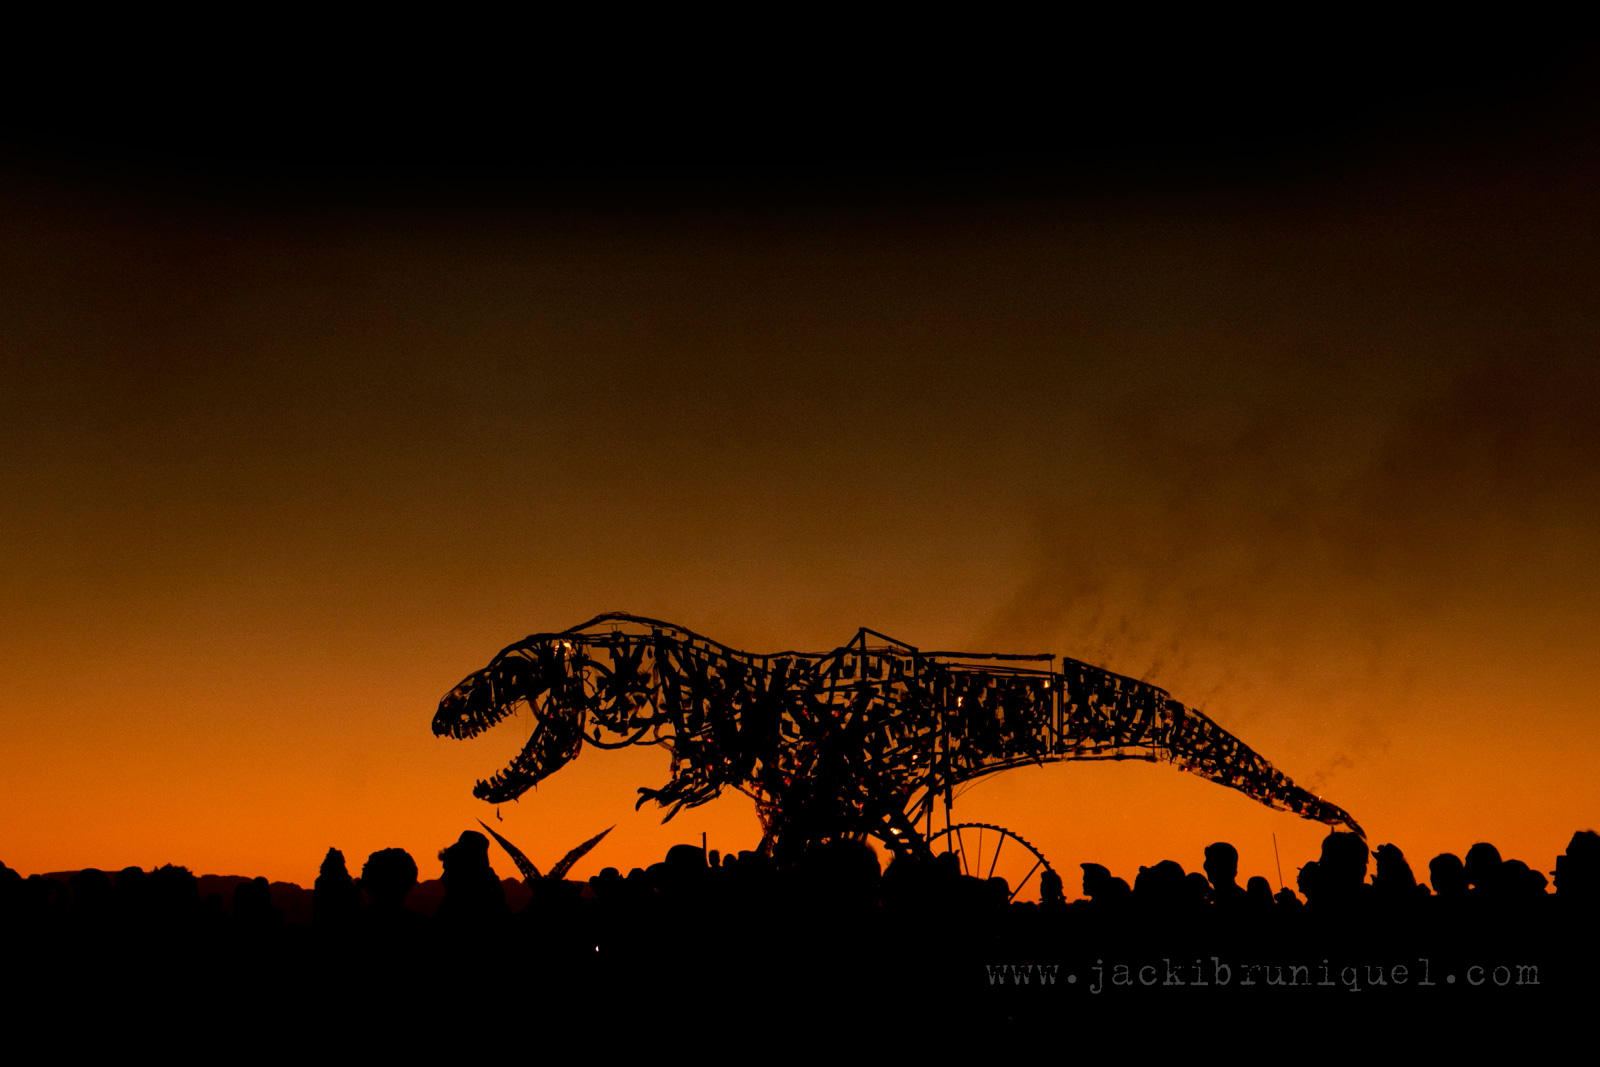 Afrika-Burn-2016-Creative-South-African-Photographer-Jacki-Bruniquel-014.jpg